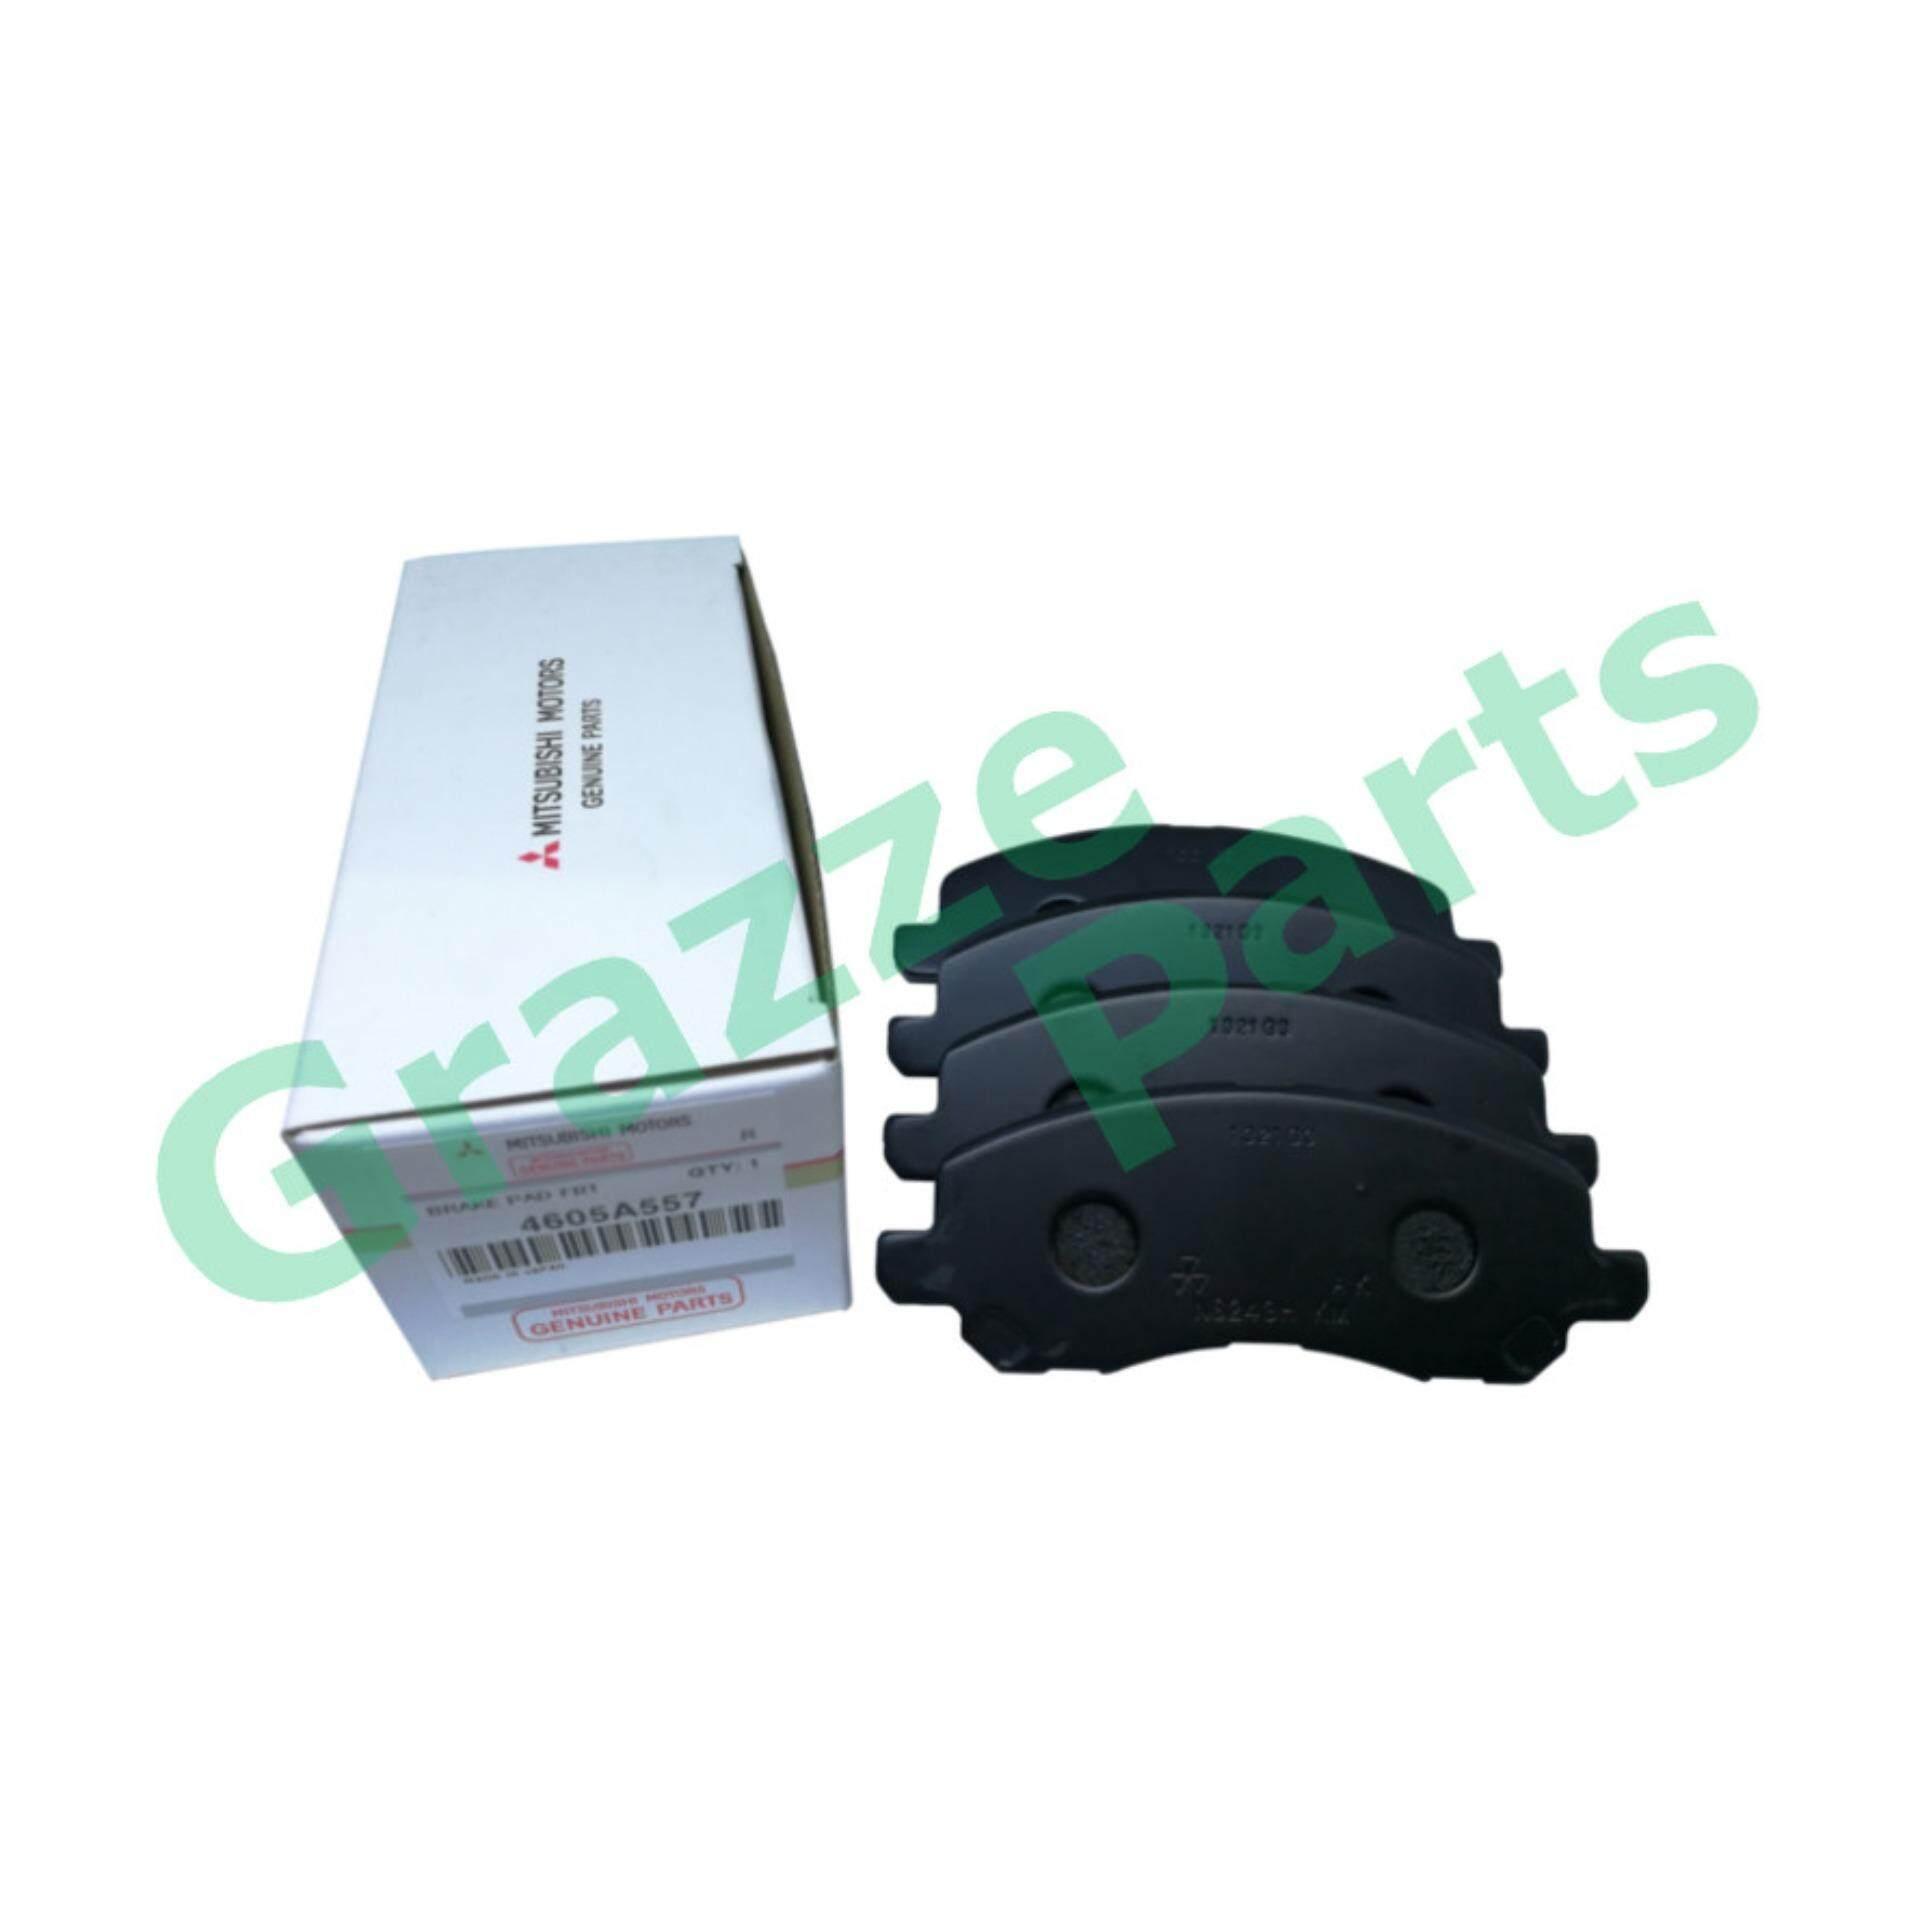 Mitsubishi front brake pad for Lancer GT Inspira ASX Grandis Sportback Airtrek NA - 4605A557